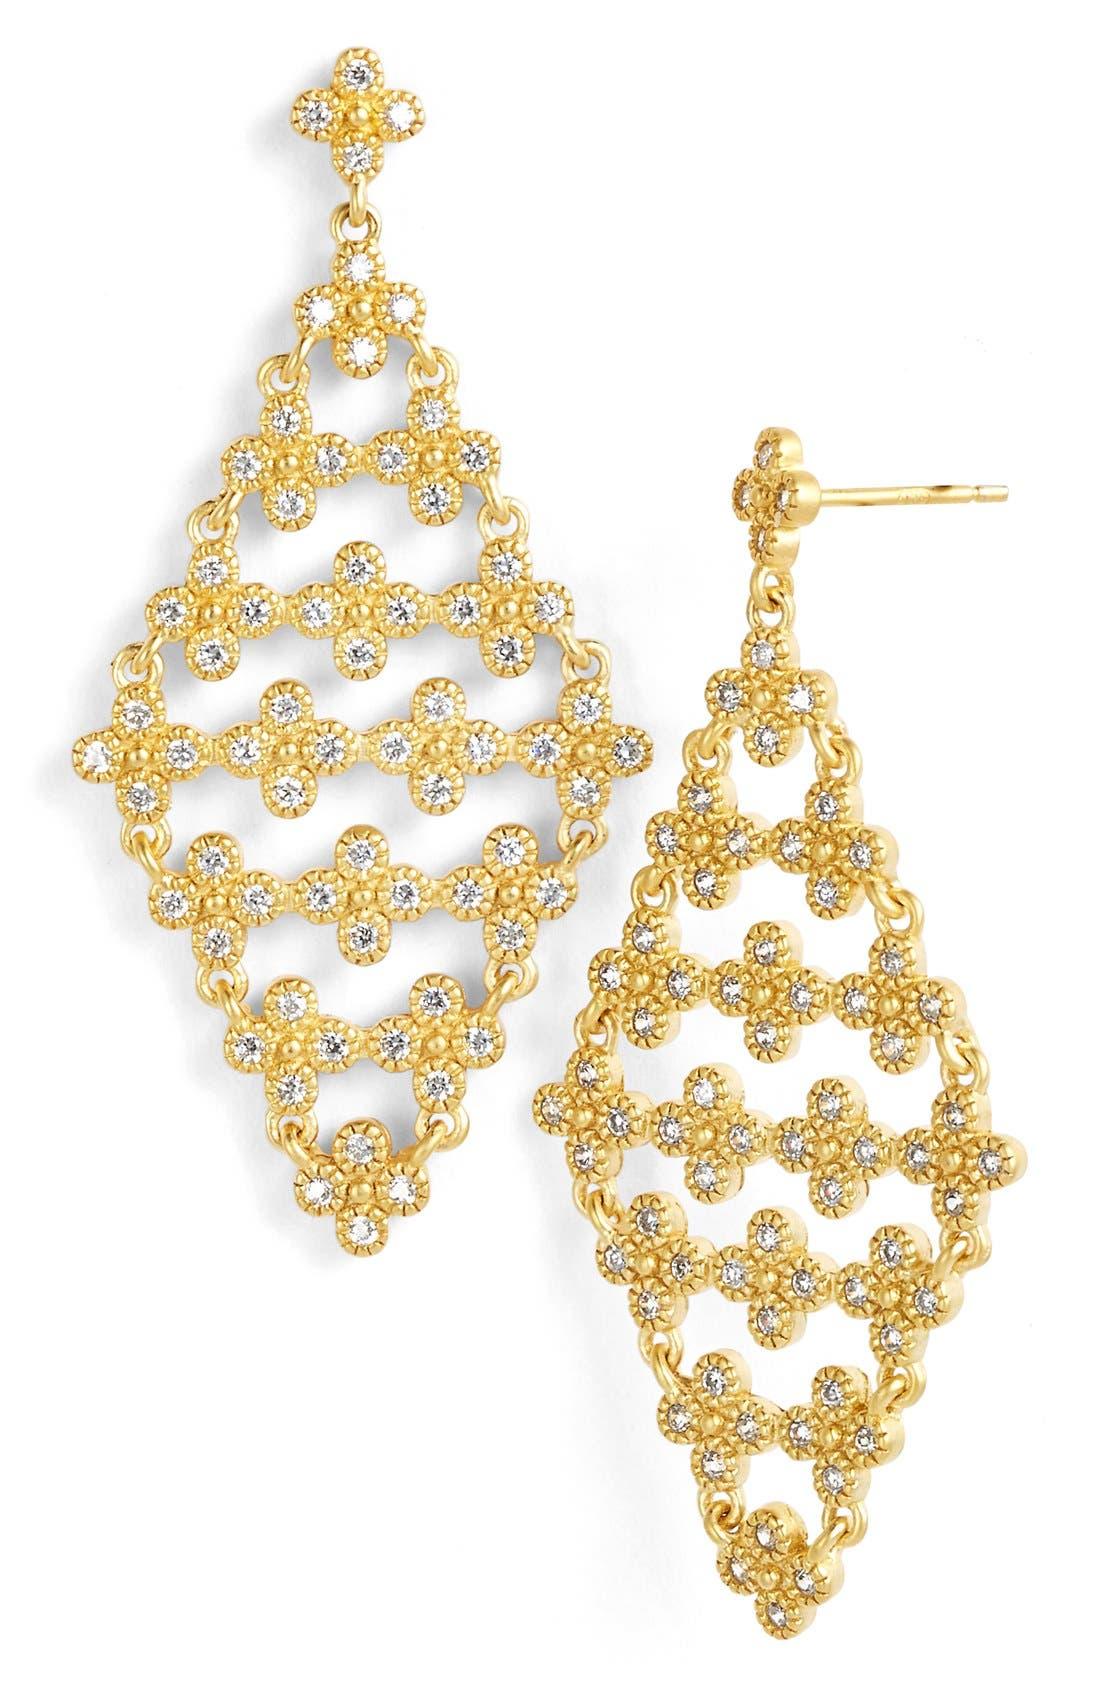 Main Image - FREIDA ROTHMAN 'Metropolitan' Floral Drop Earrings